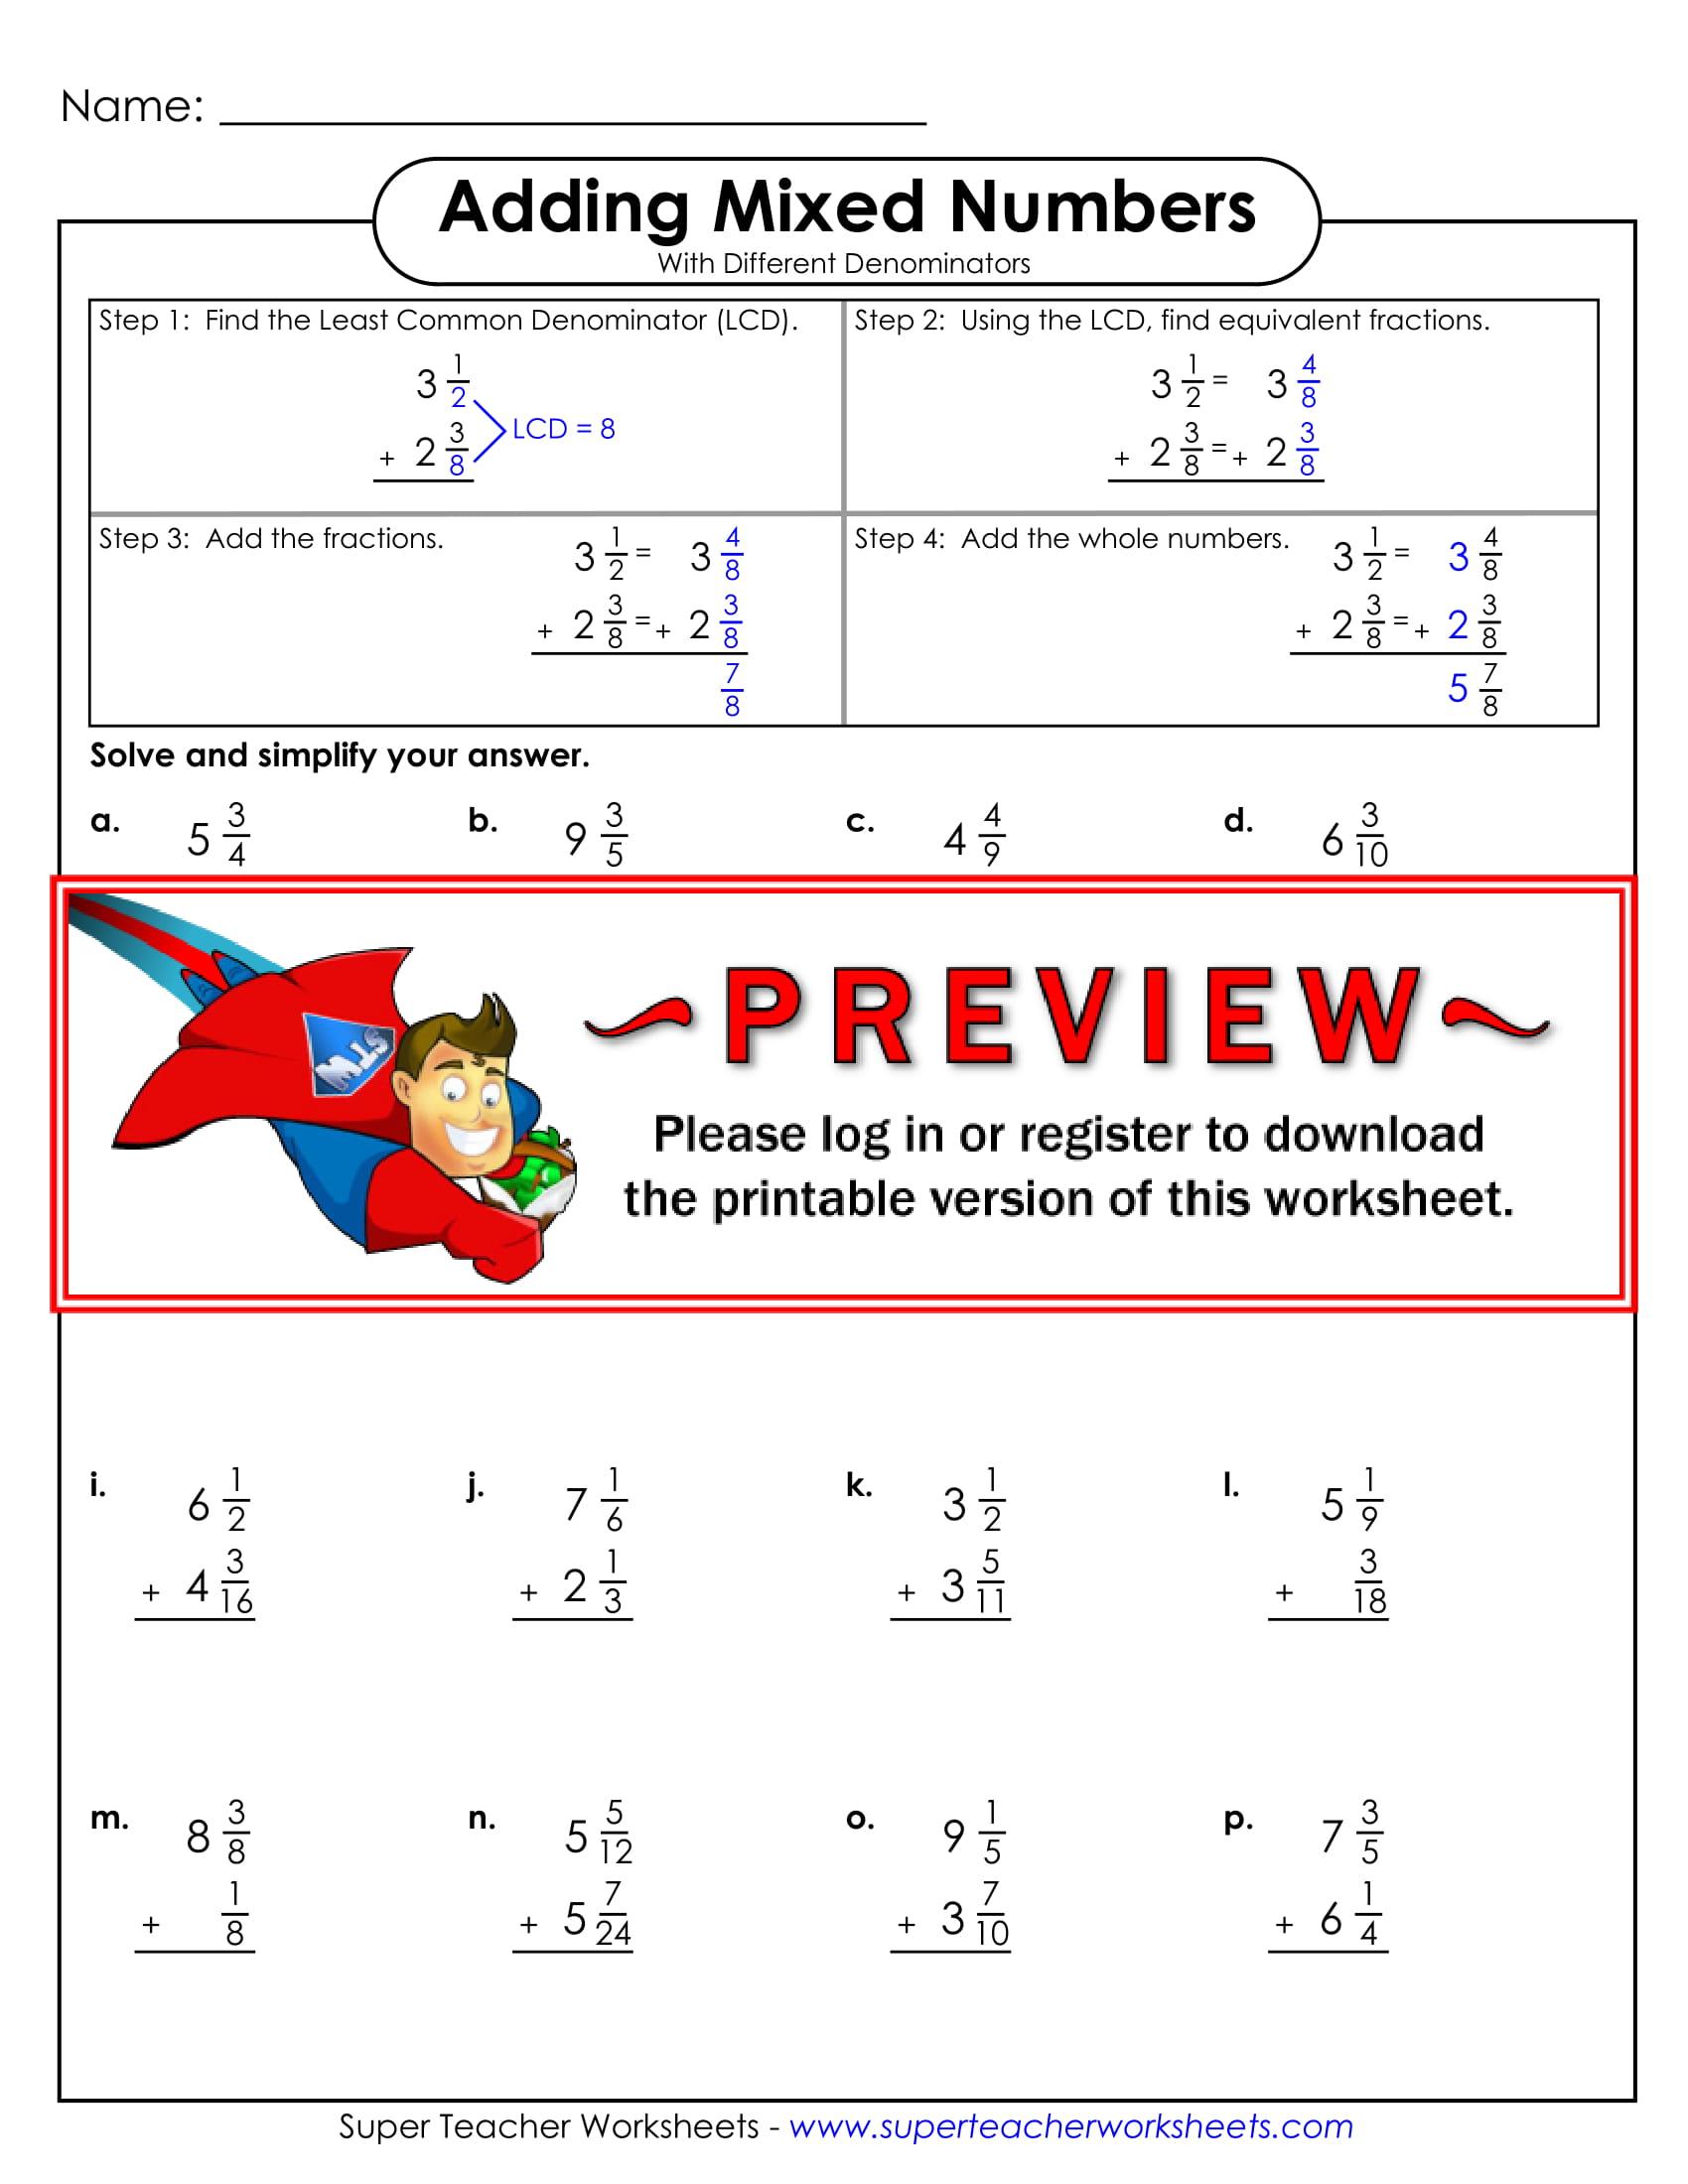 Subtracting Mixed Numbers Worksheet